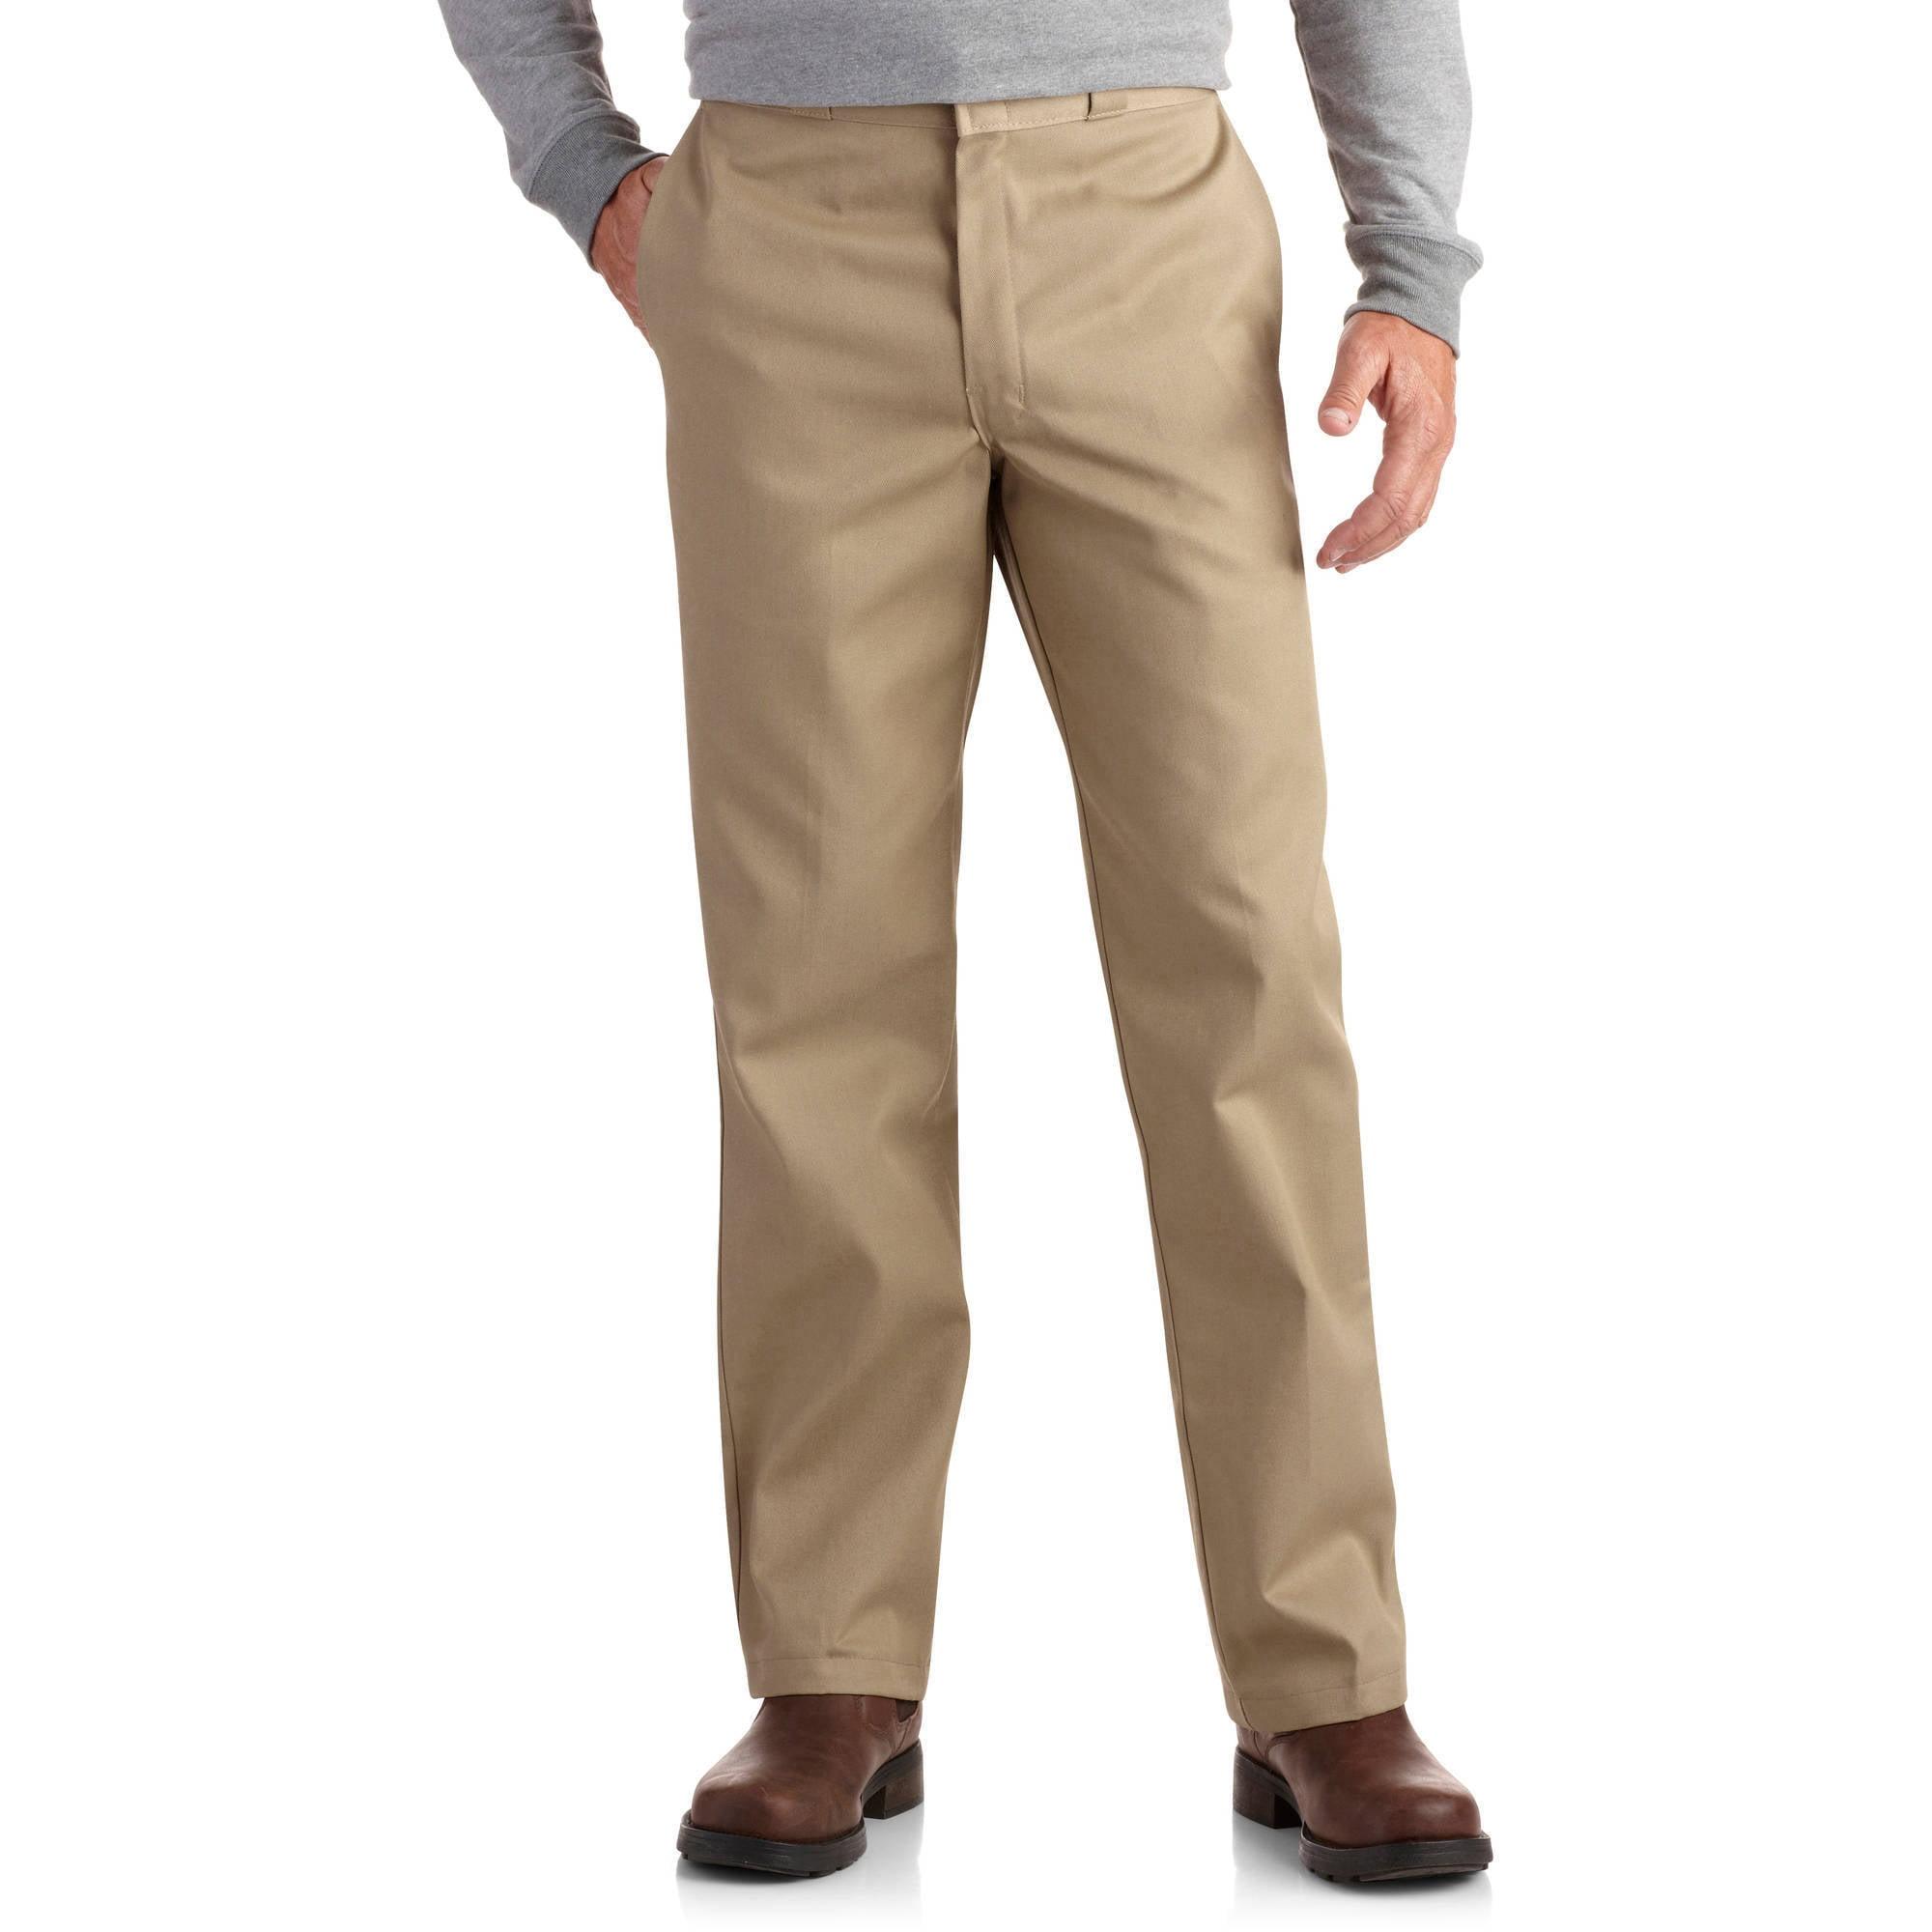 Dickies Men's 874 Traditional Work Pants - Walmart.com